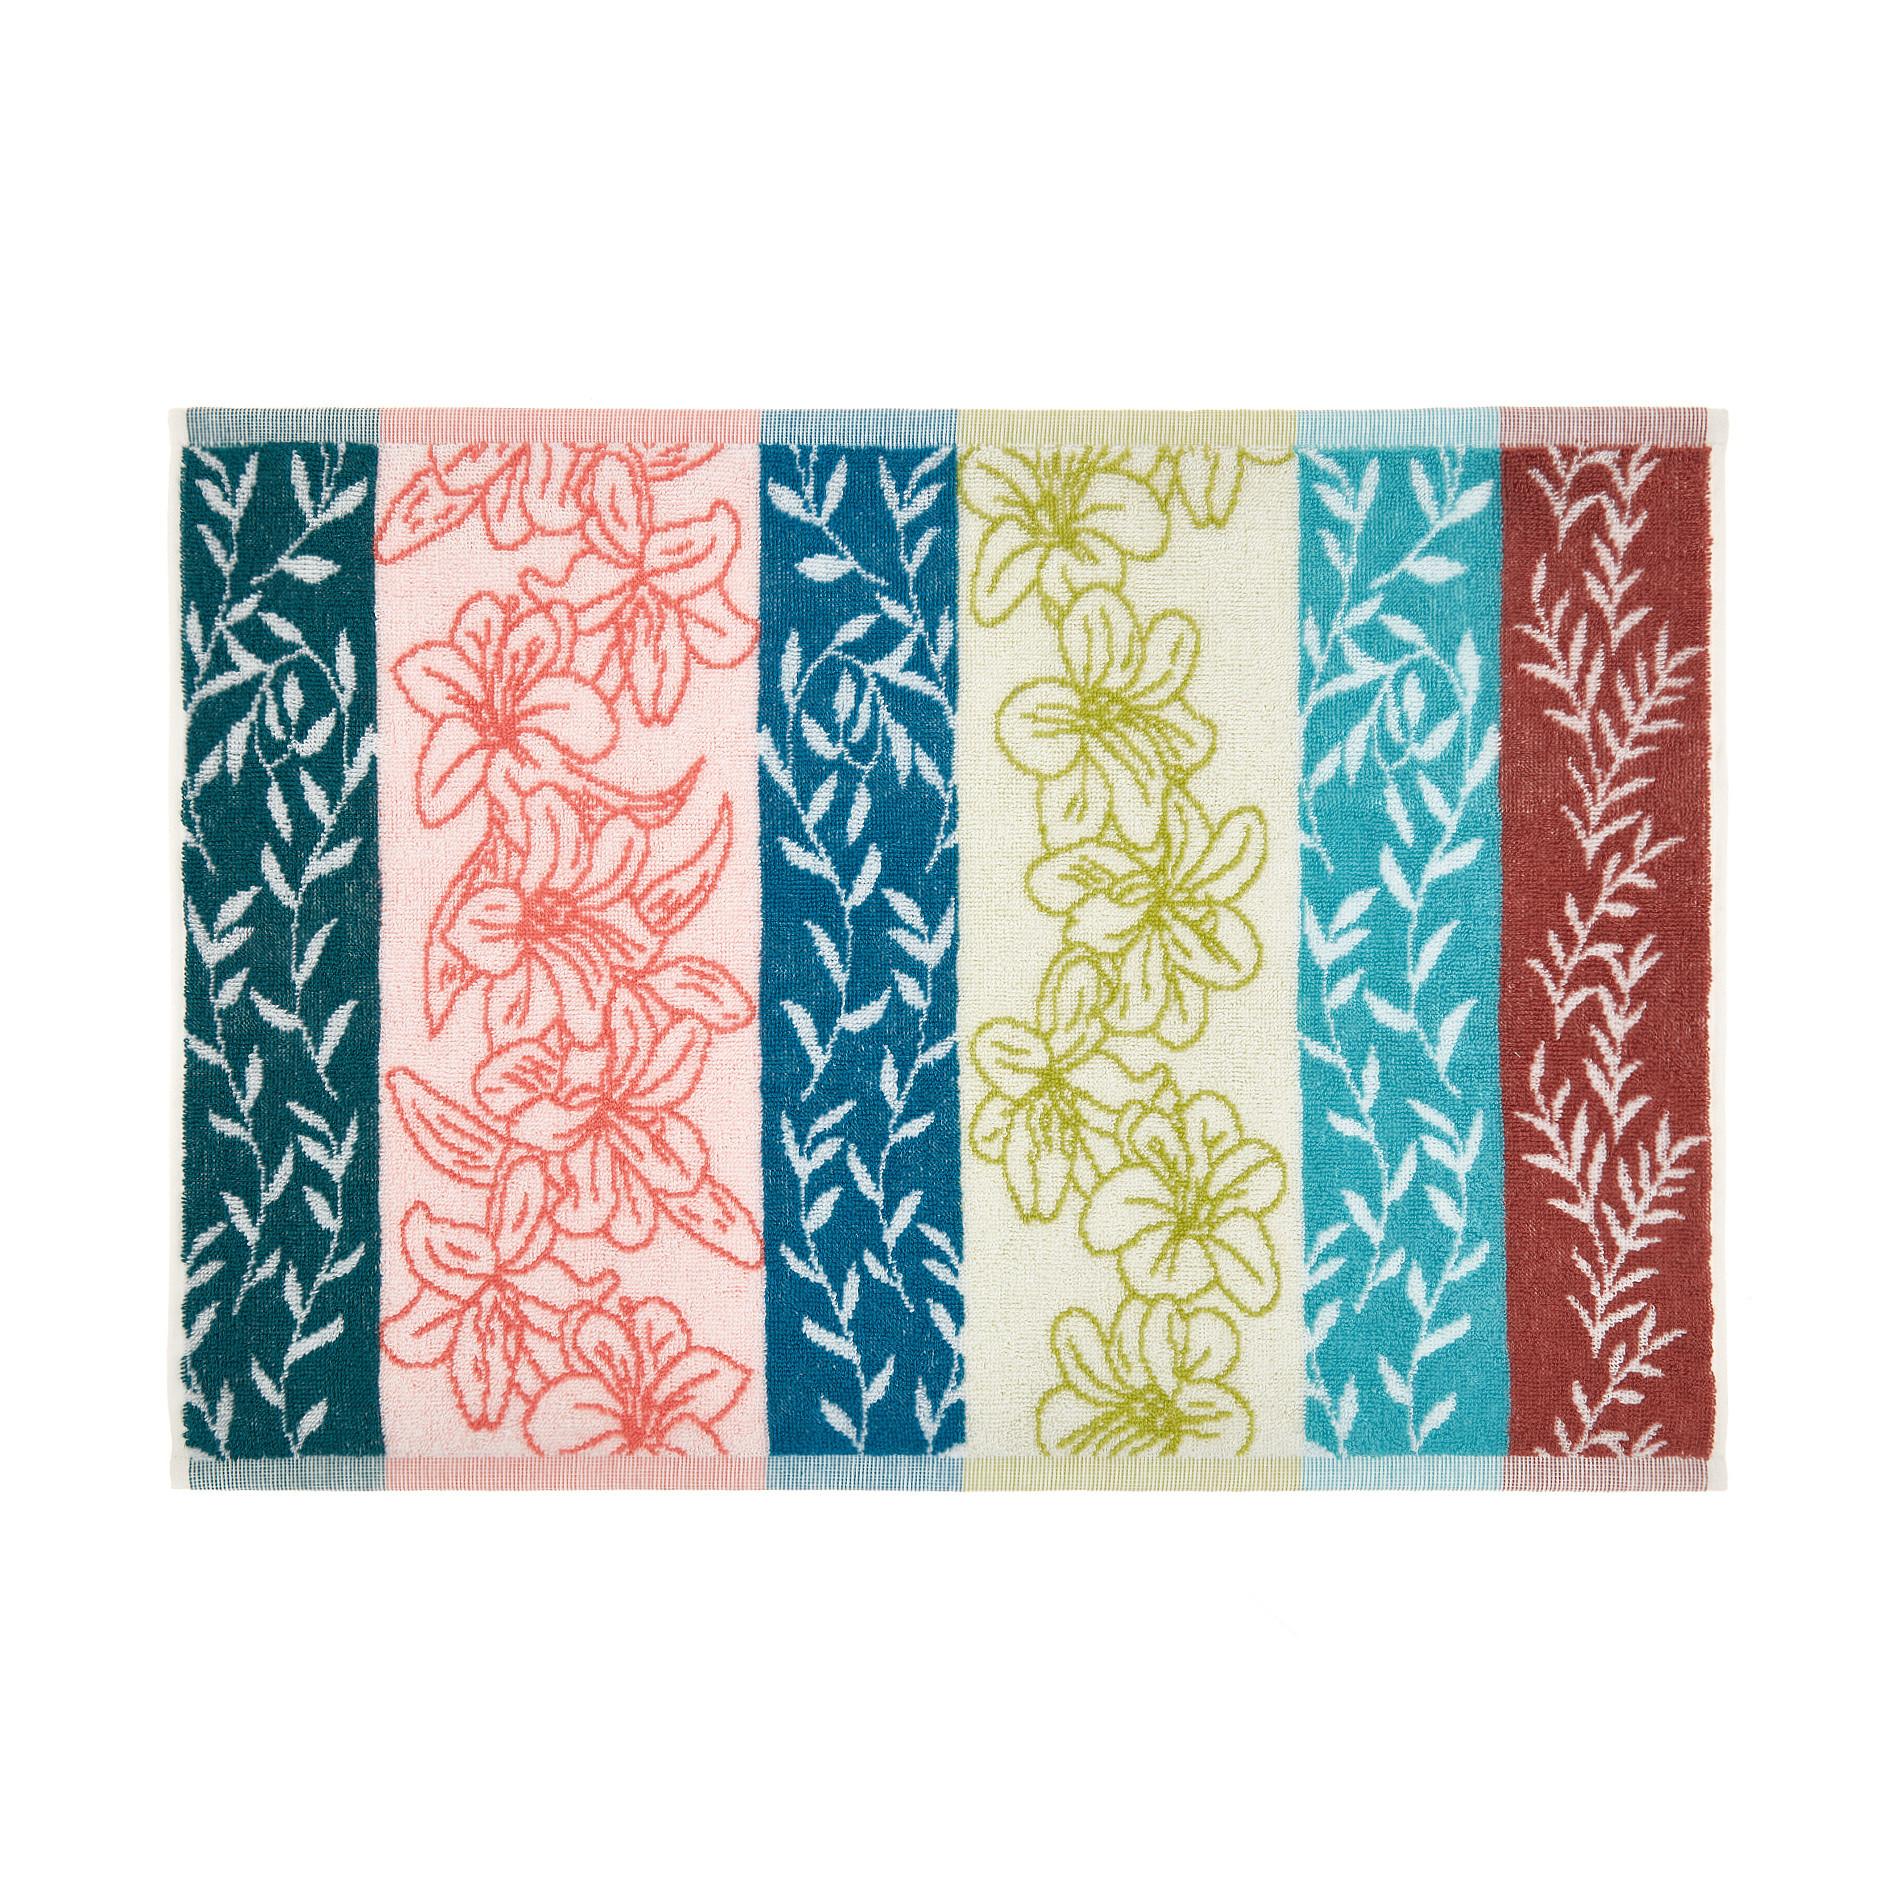 Asciugamano cotone jacquard motivo floreale, Multicolor, large image number 1